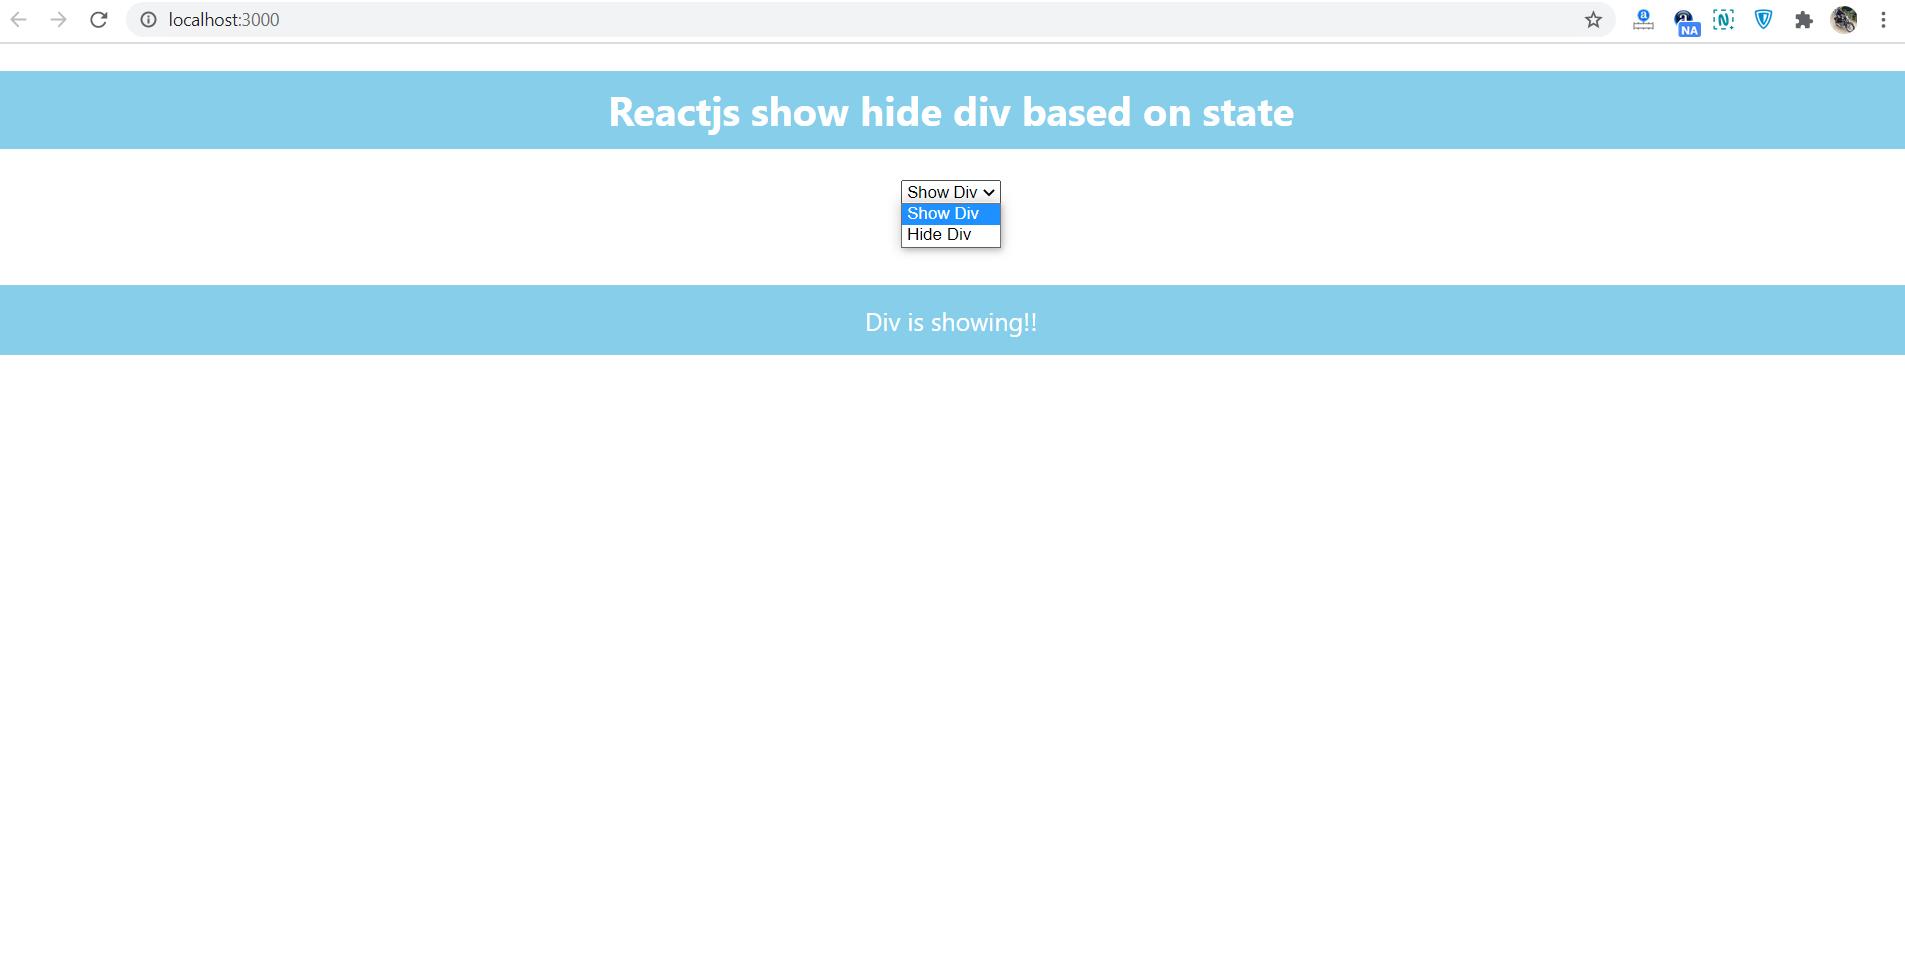 Reactjs show hide div based on state change